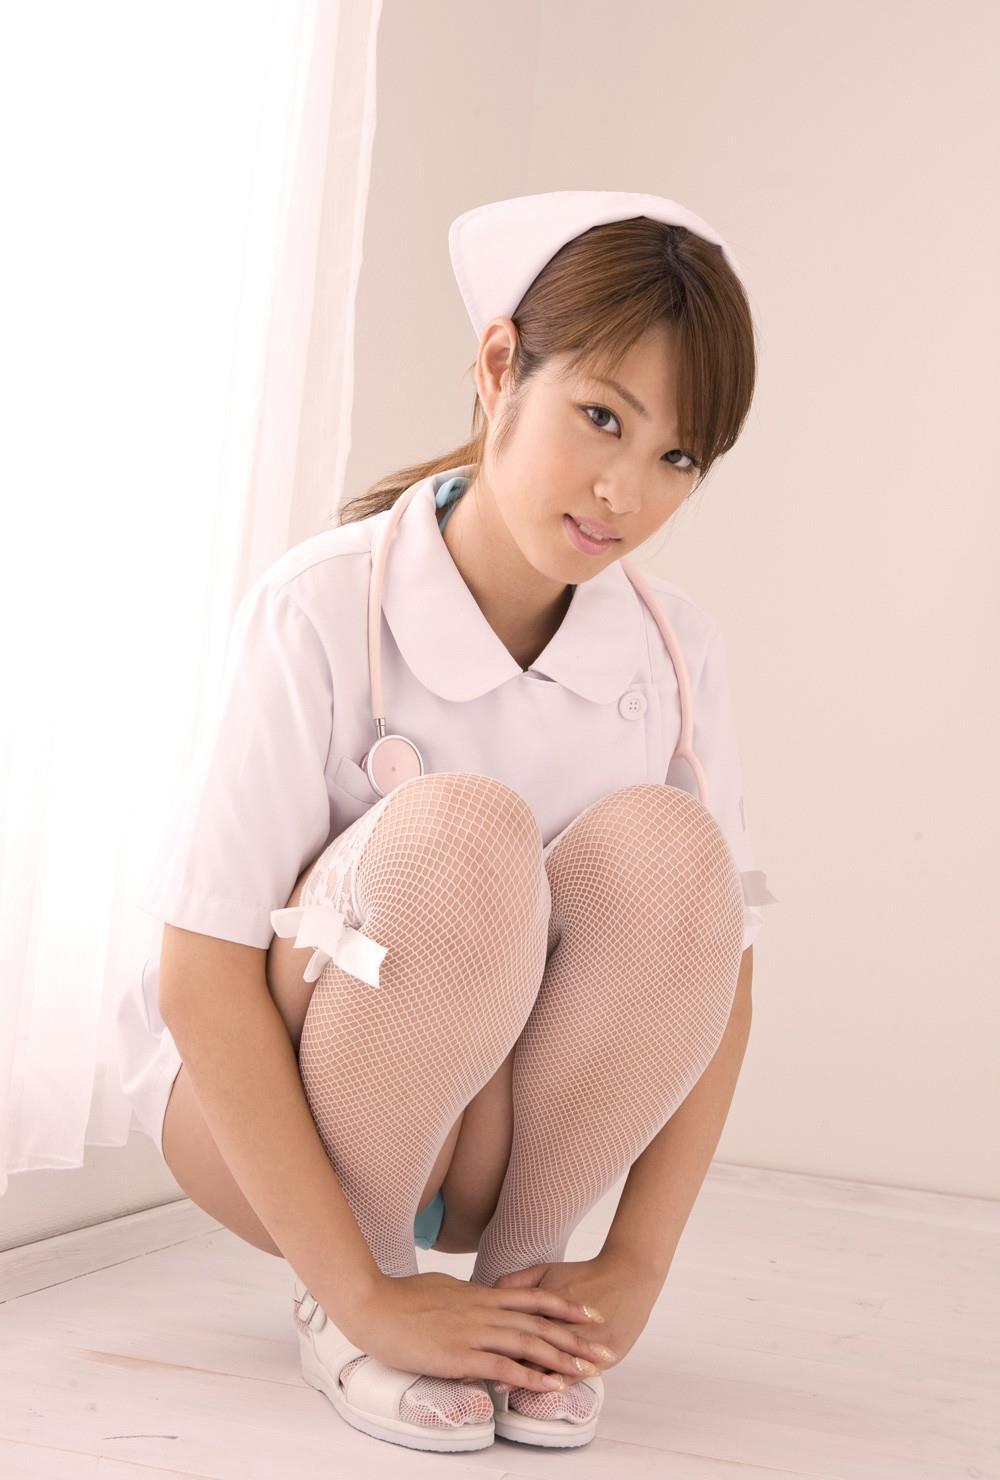 野田彩加 エロ画像 18